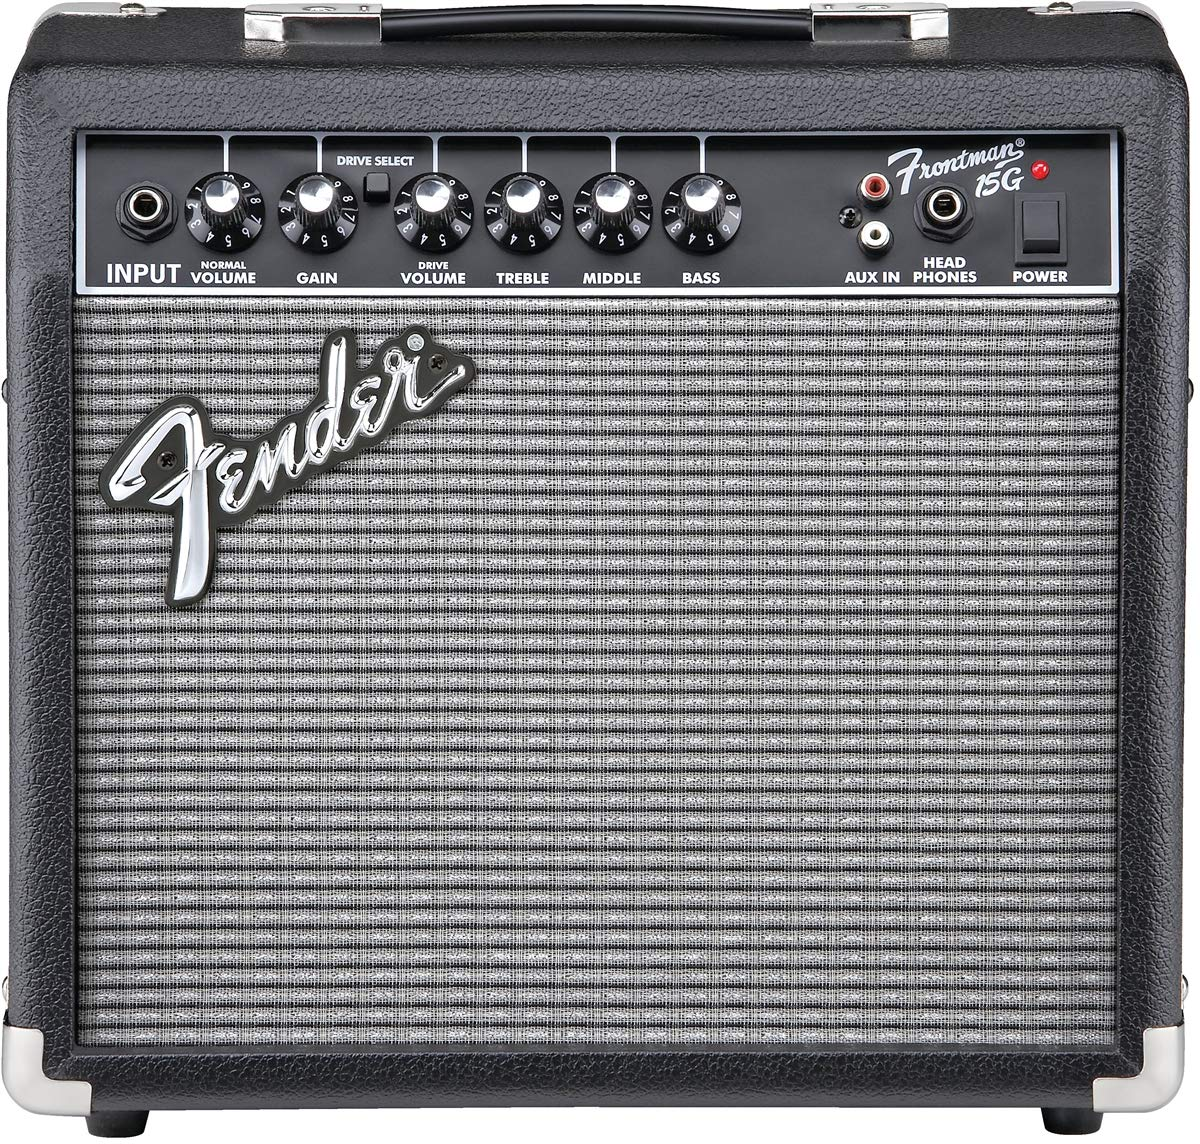 image of fender practice amp